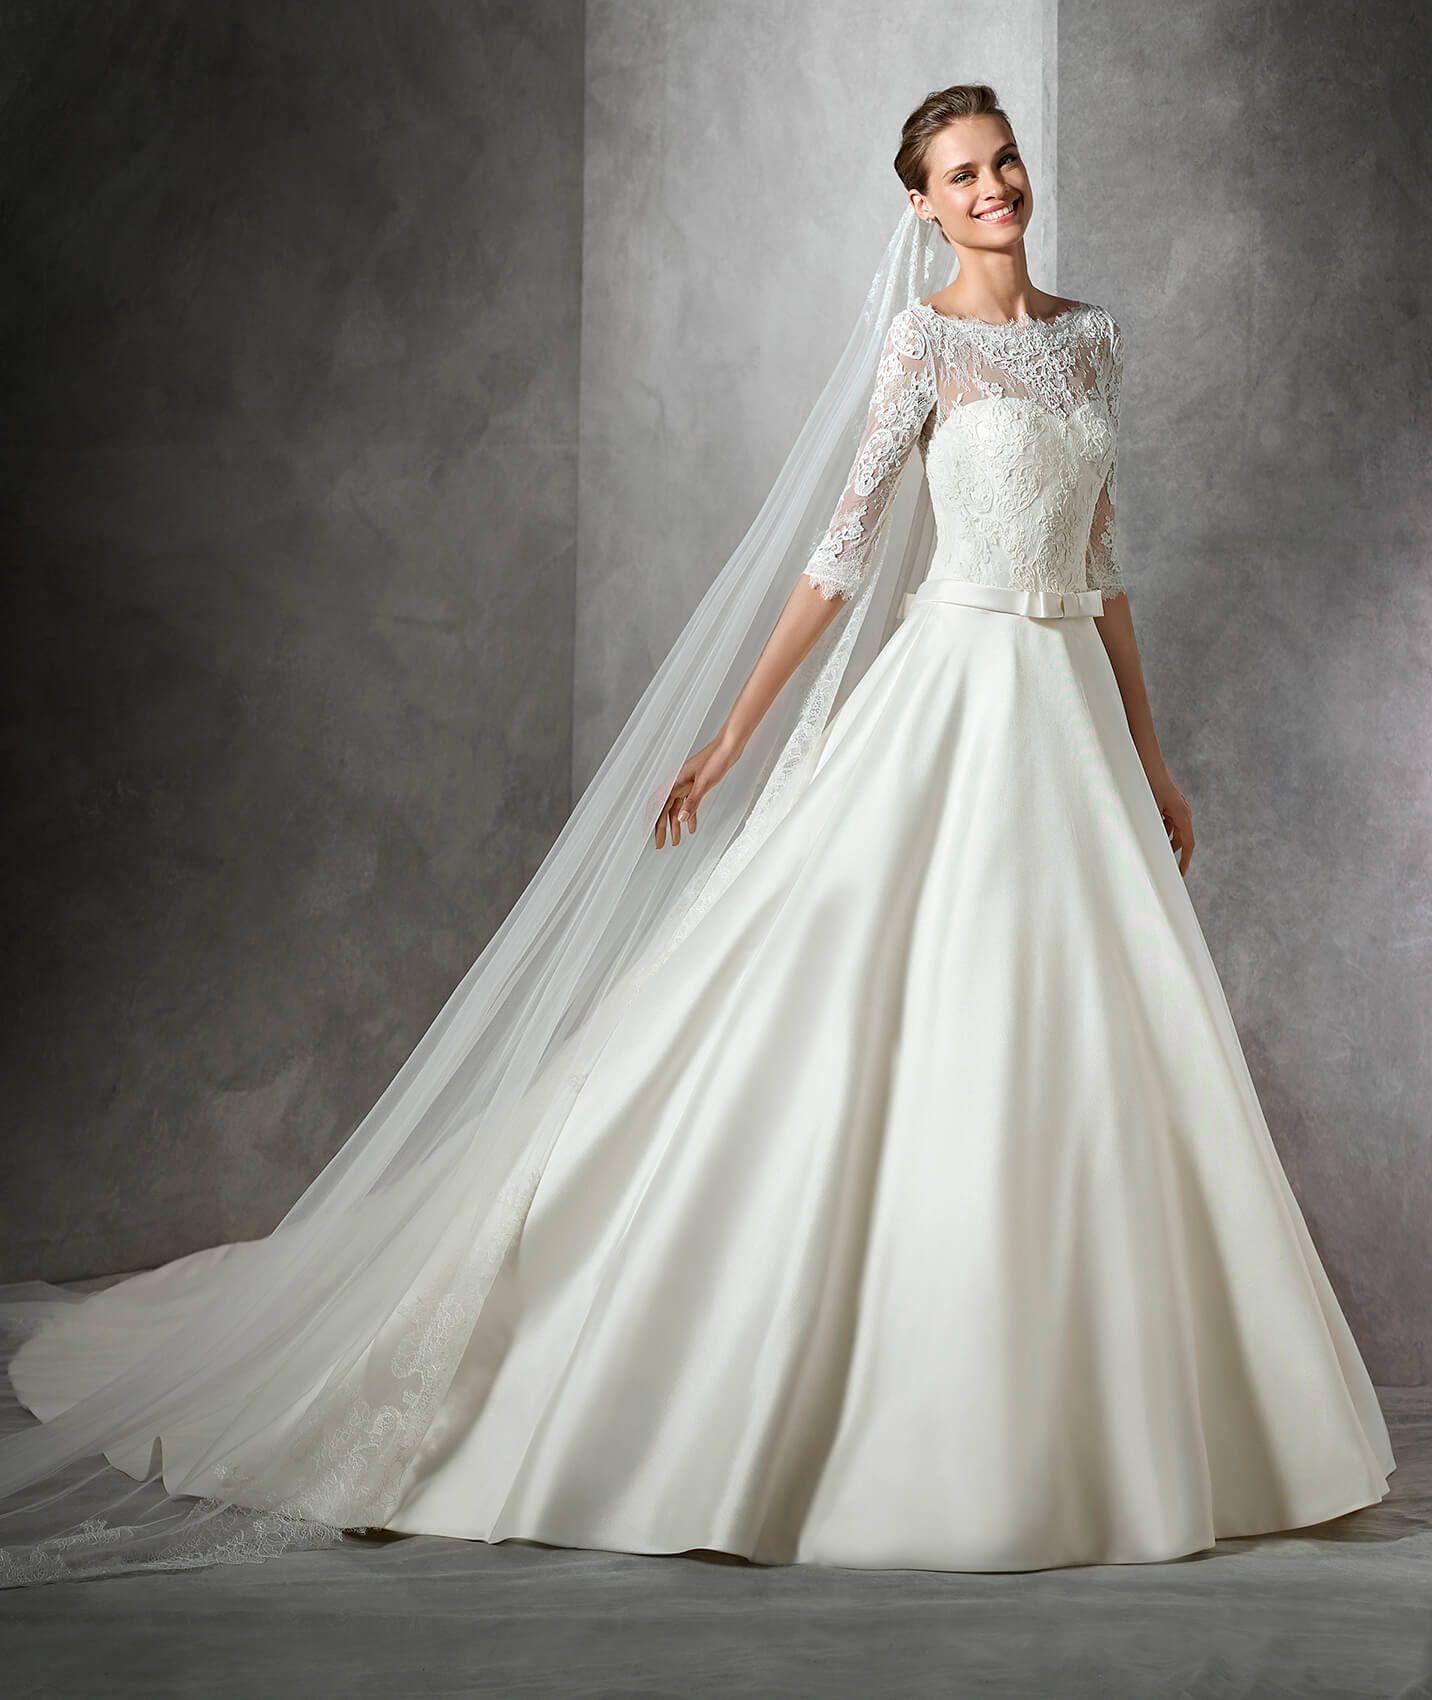 Toricela Princess Style Wedding Dress Pronovias Wedding Dress Wedding Dresses Contemporary Wedding Dress